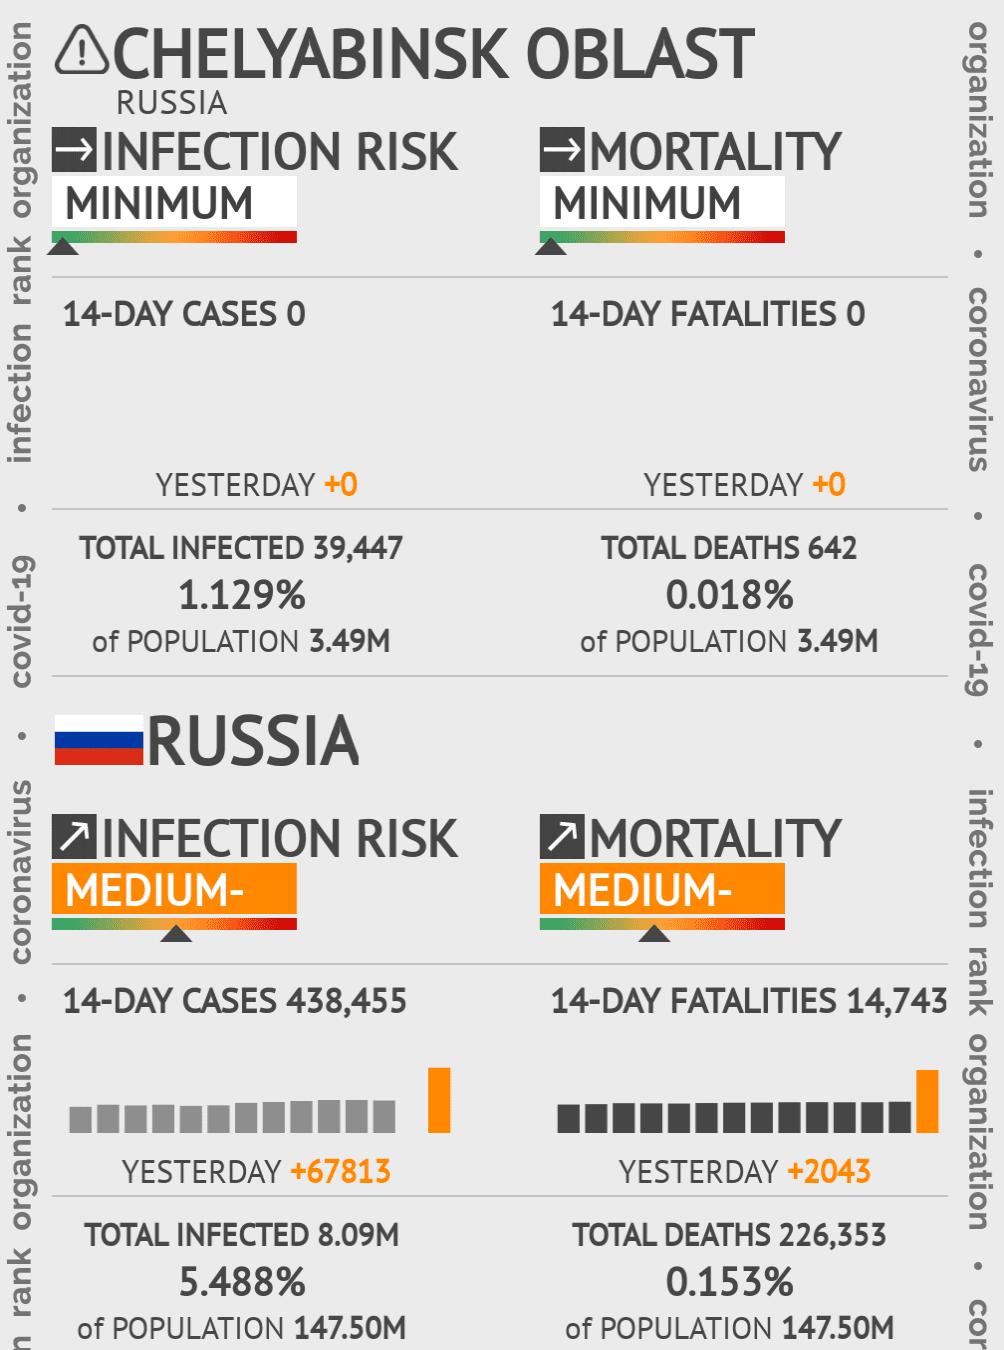 Chelyabinsk Oblast Coronavirus Covid-19 Risk of Infection on March 06, 2021